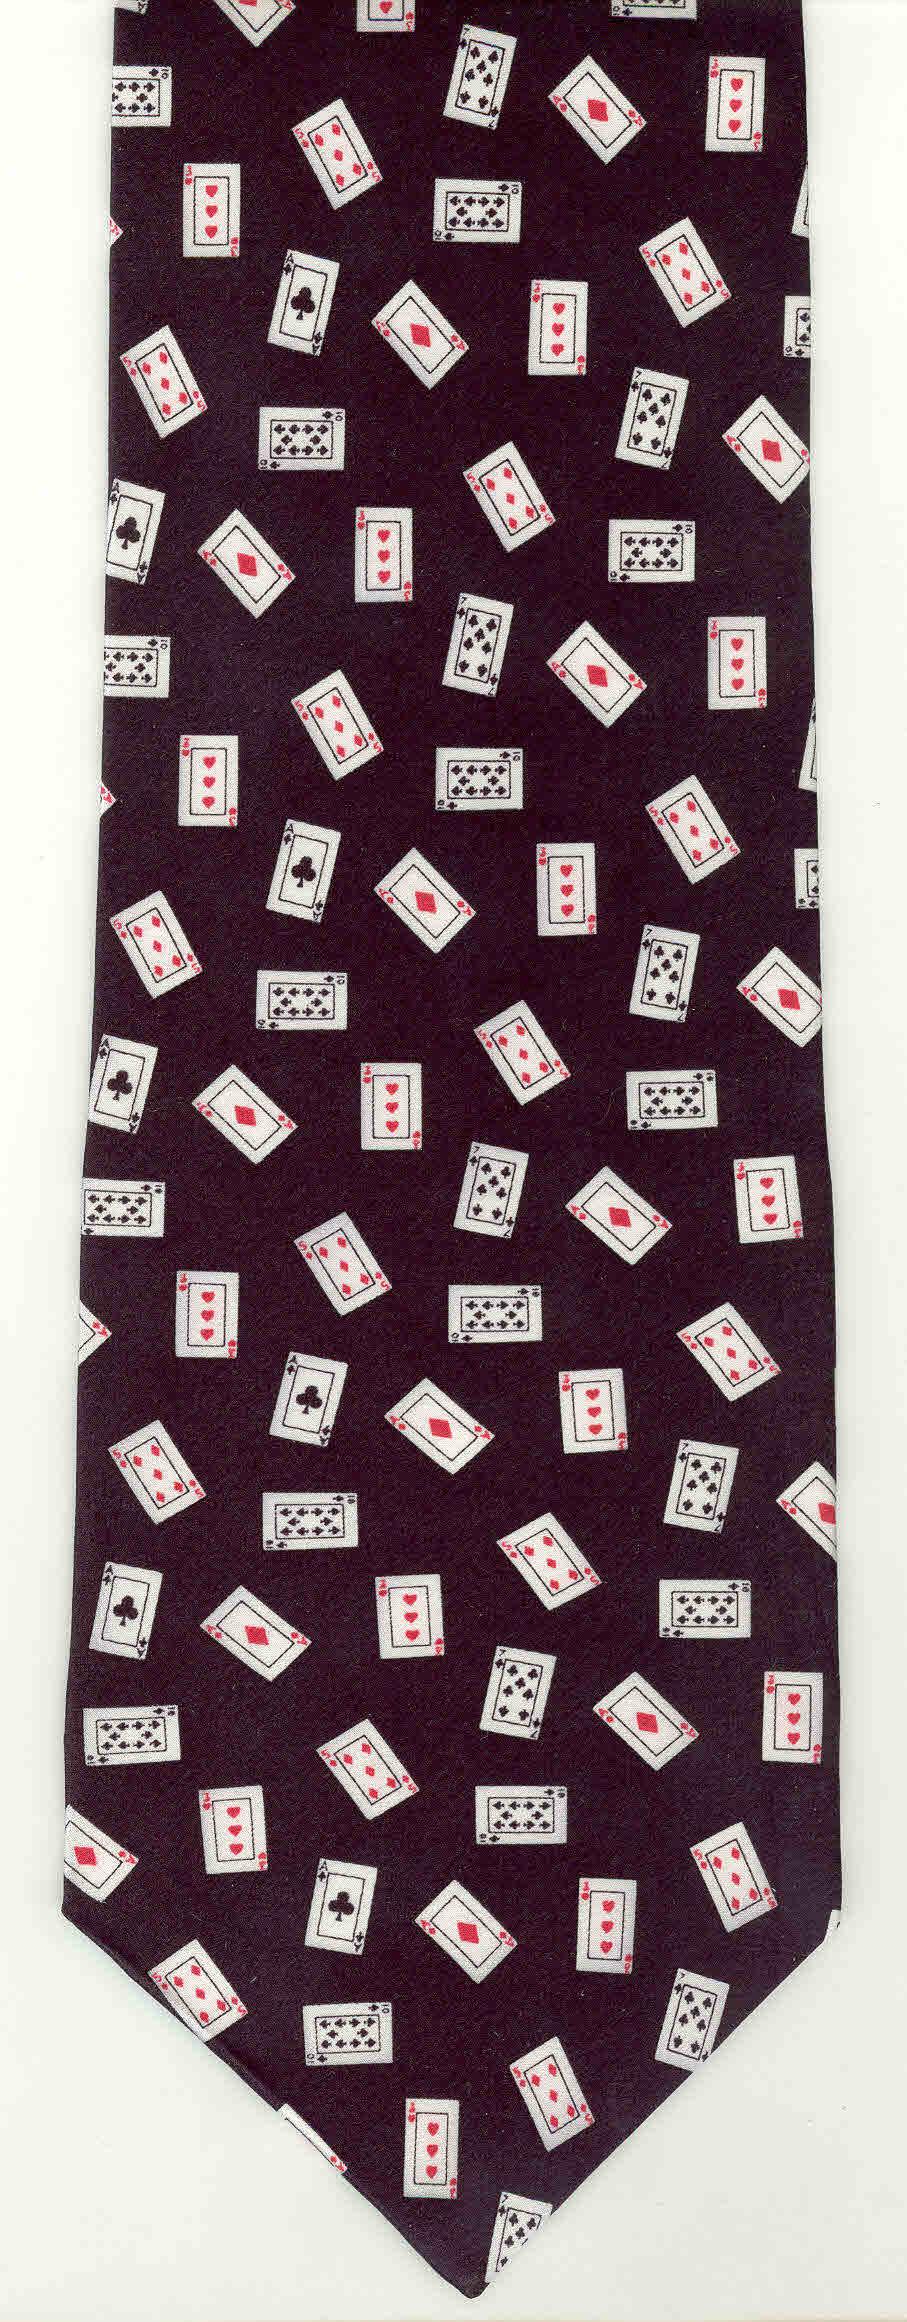 045 Tiny Cards (B).jpg